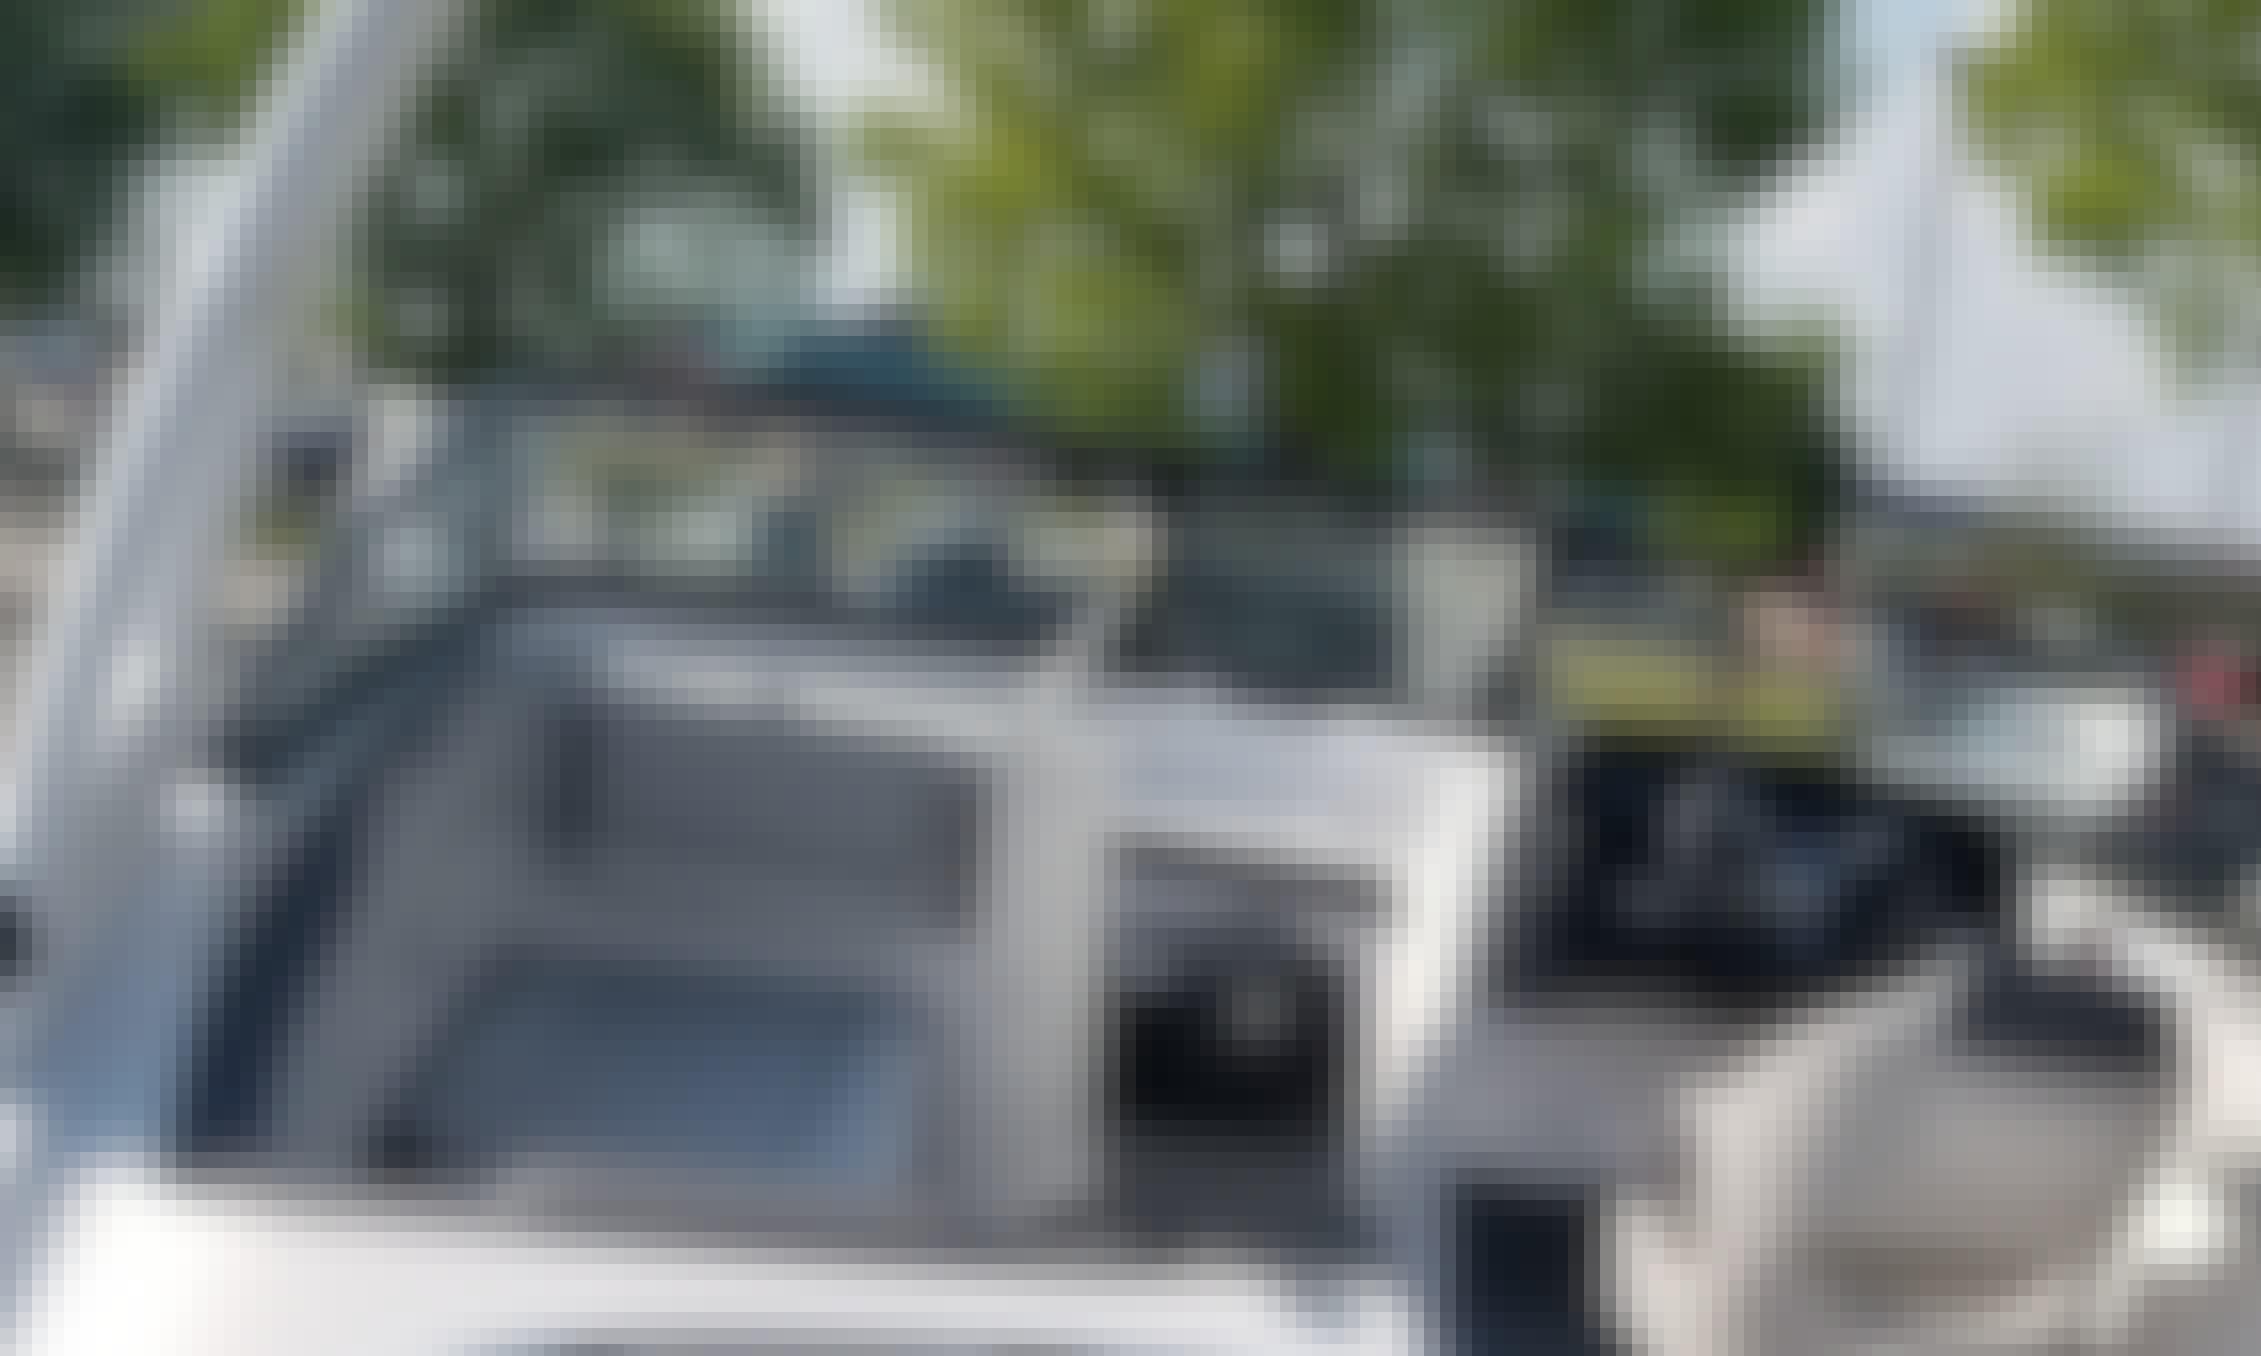 2020 Yamaha AR 190 in North Myrtle Beach